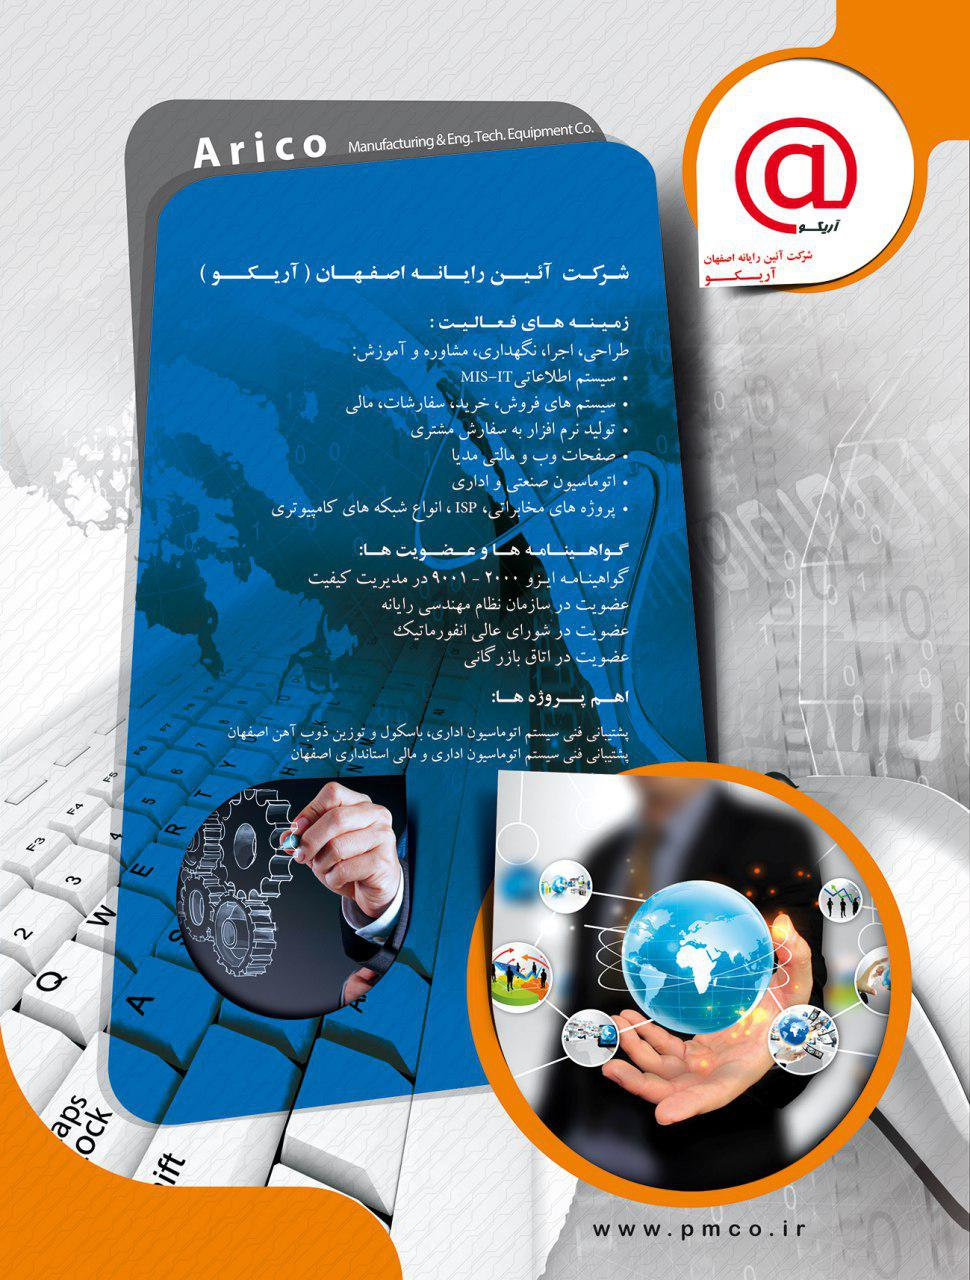 شركت آئين رايانه اصفهان  آريكو